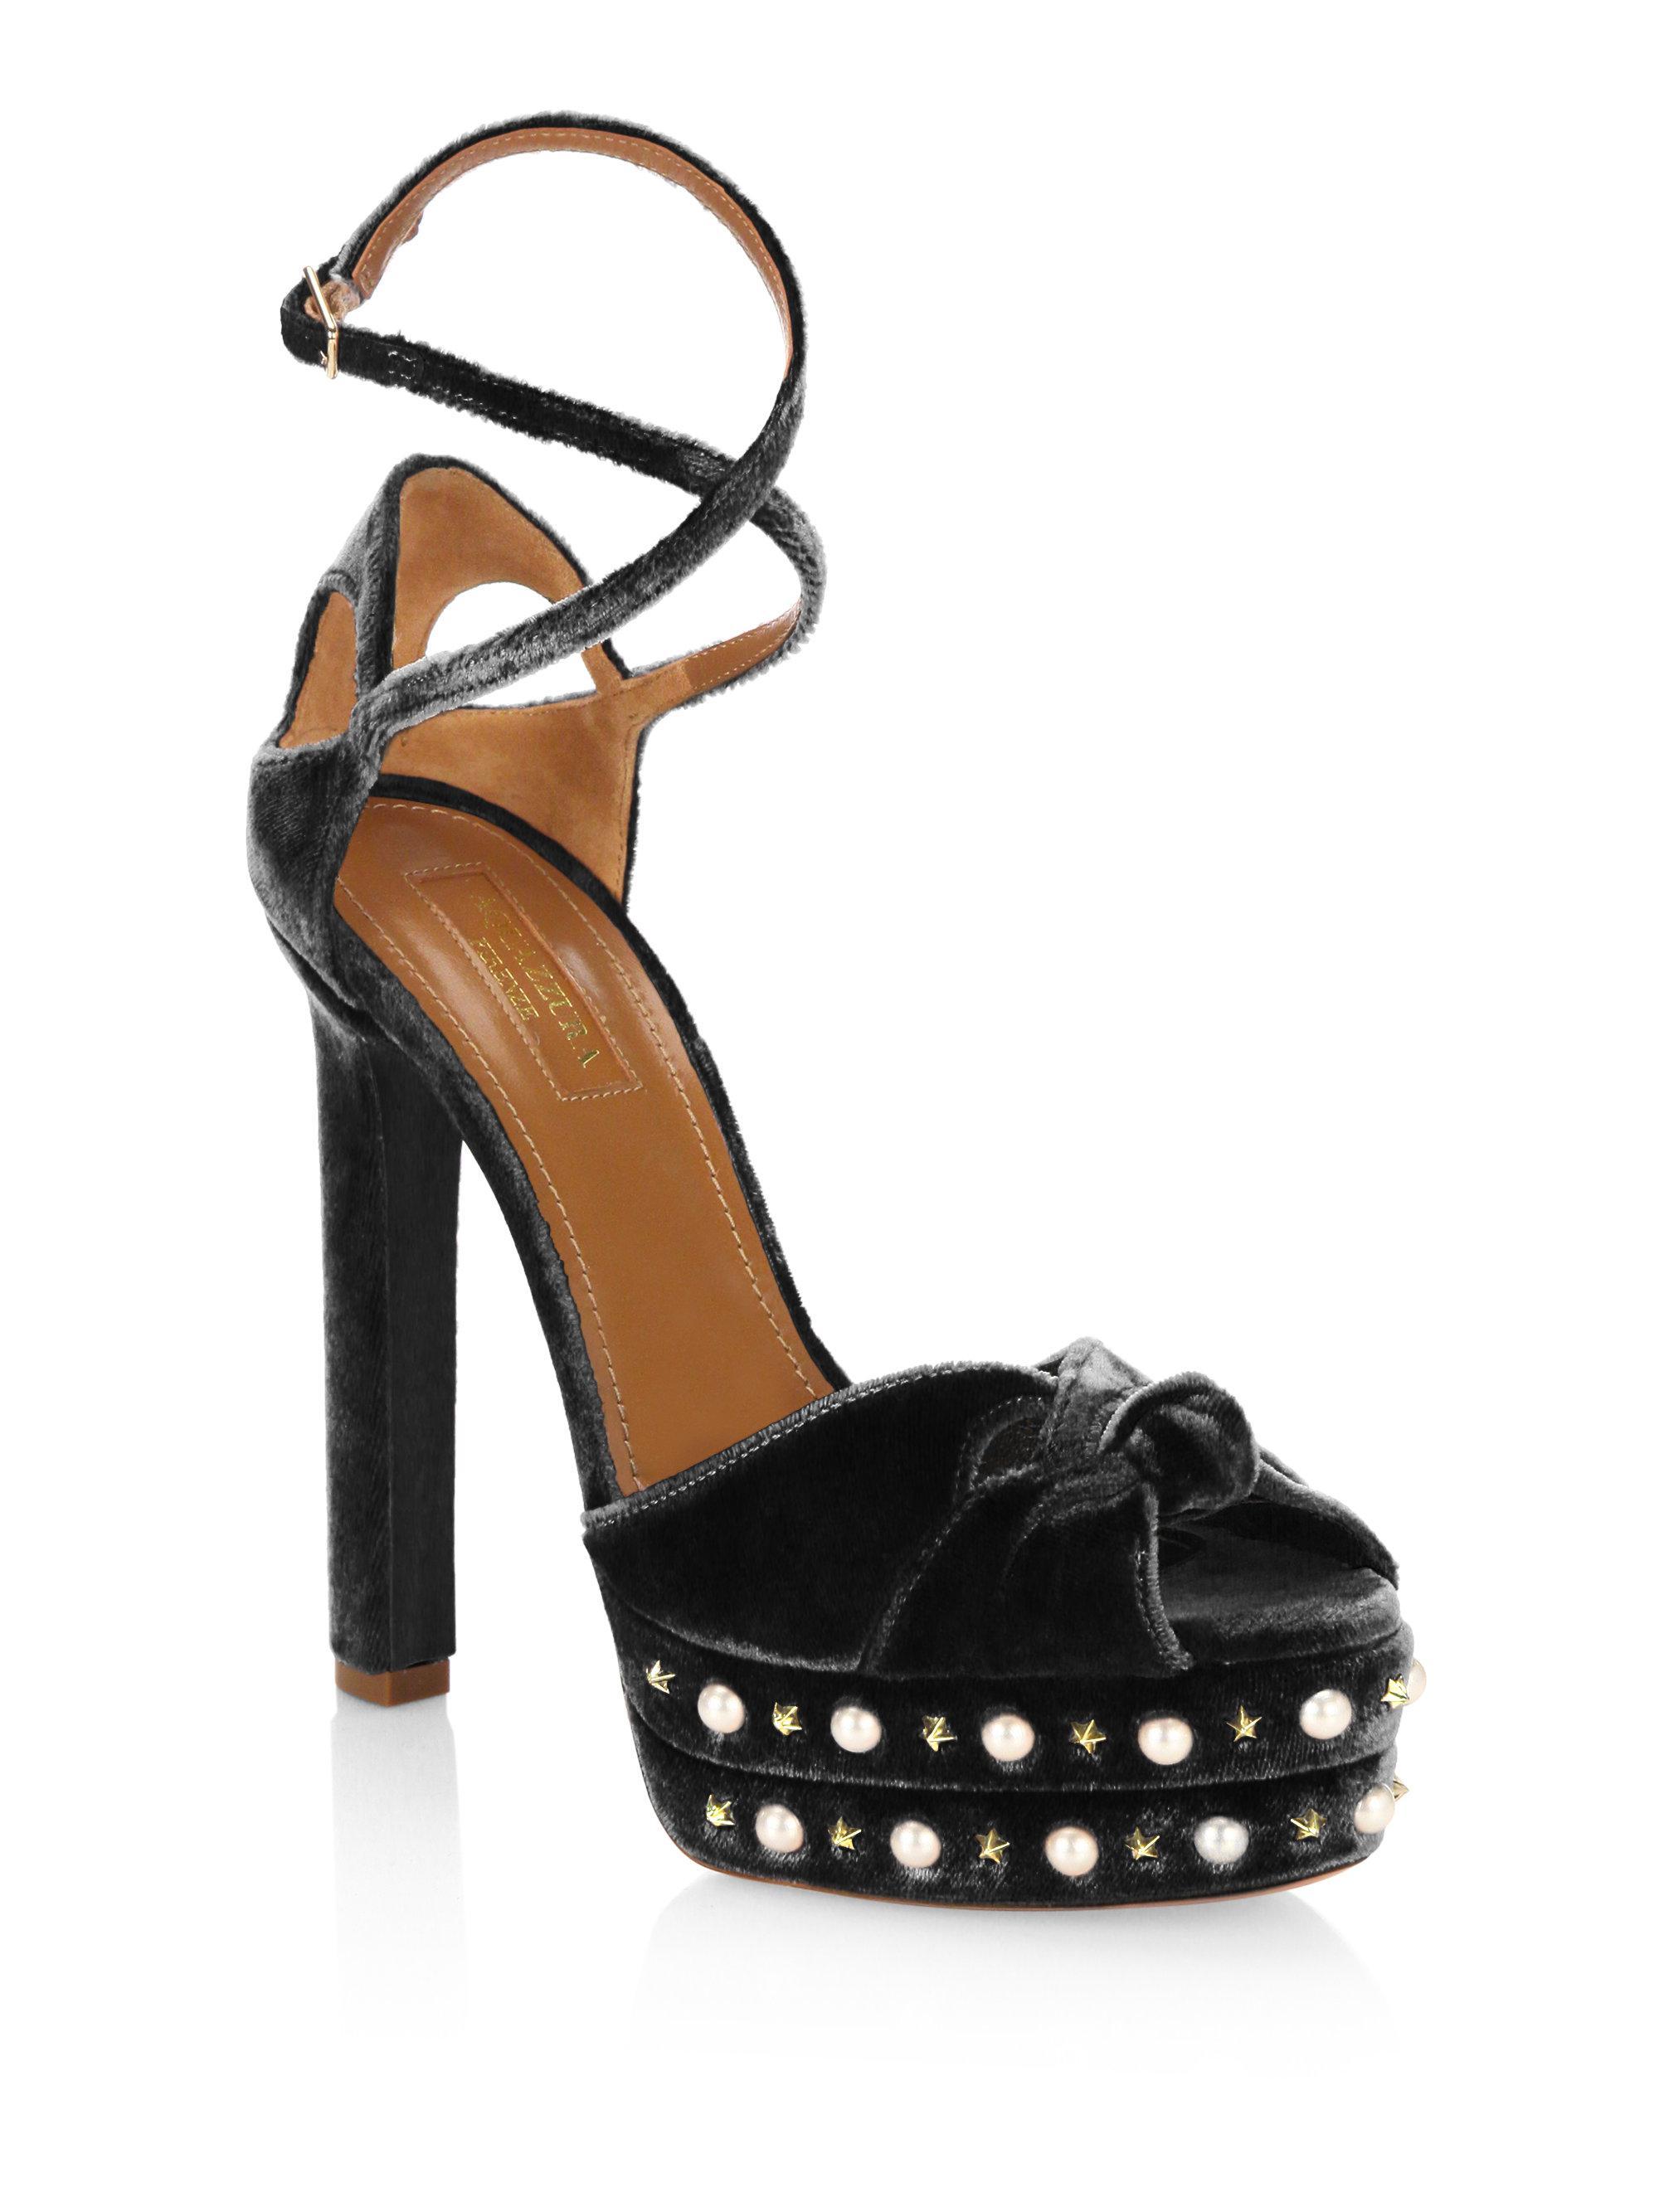 768b7bc073c Lyst - Aquazzura Harlow Velvet Pearls Platform Sandals in Black